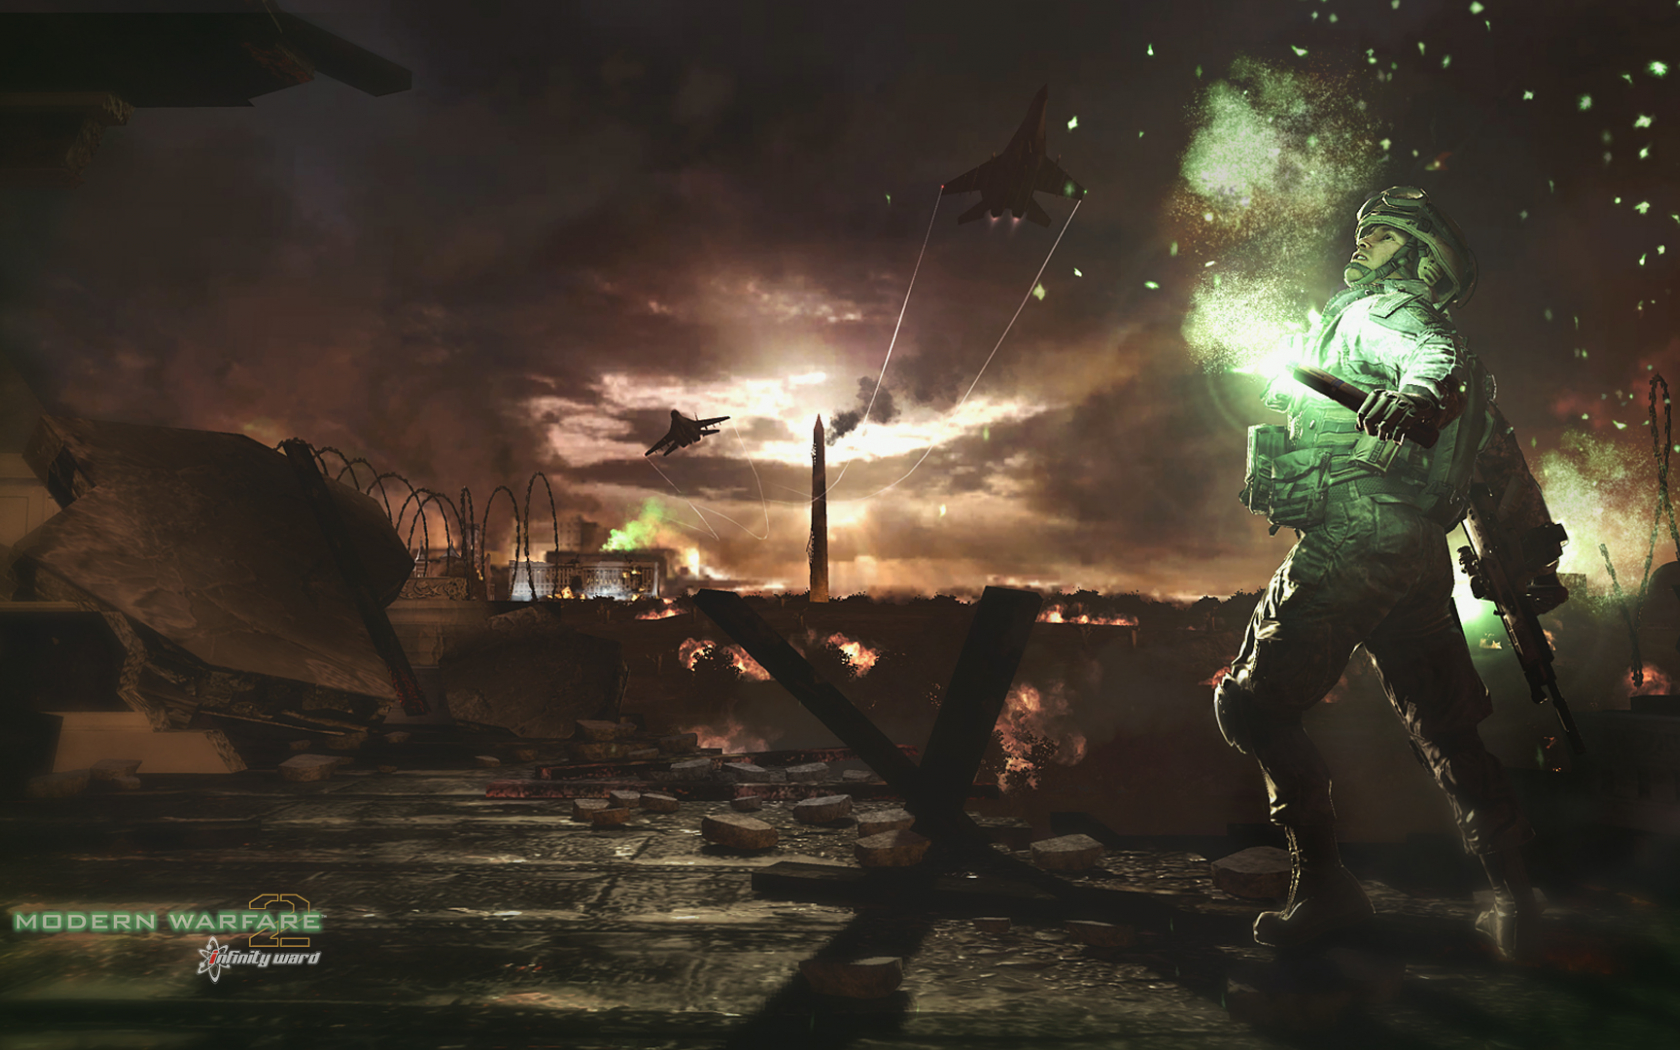 Free Download Nighttime Warzone Wallpapers Nighttime Warzone